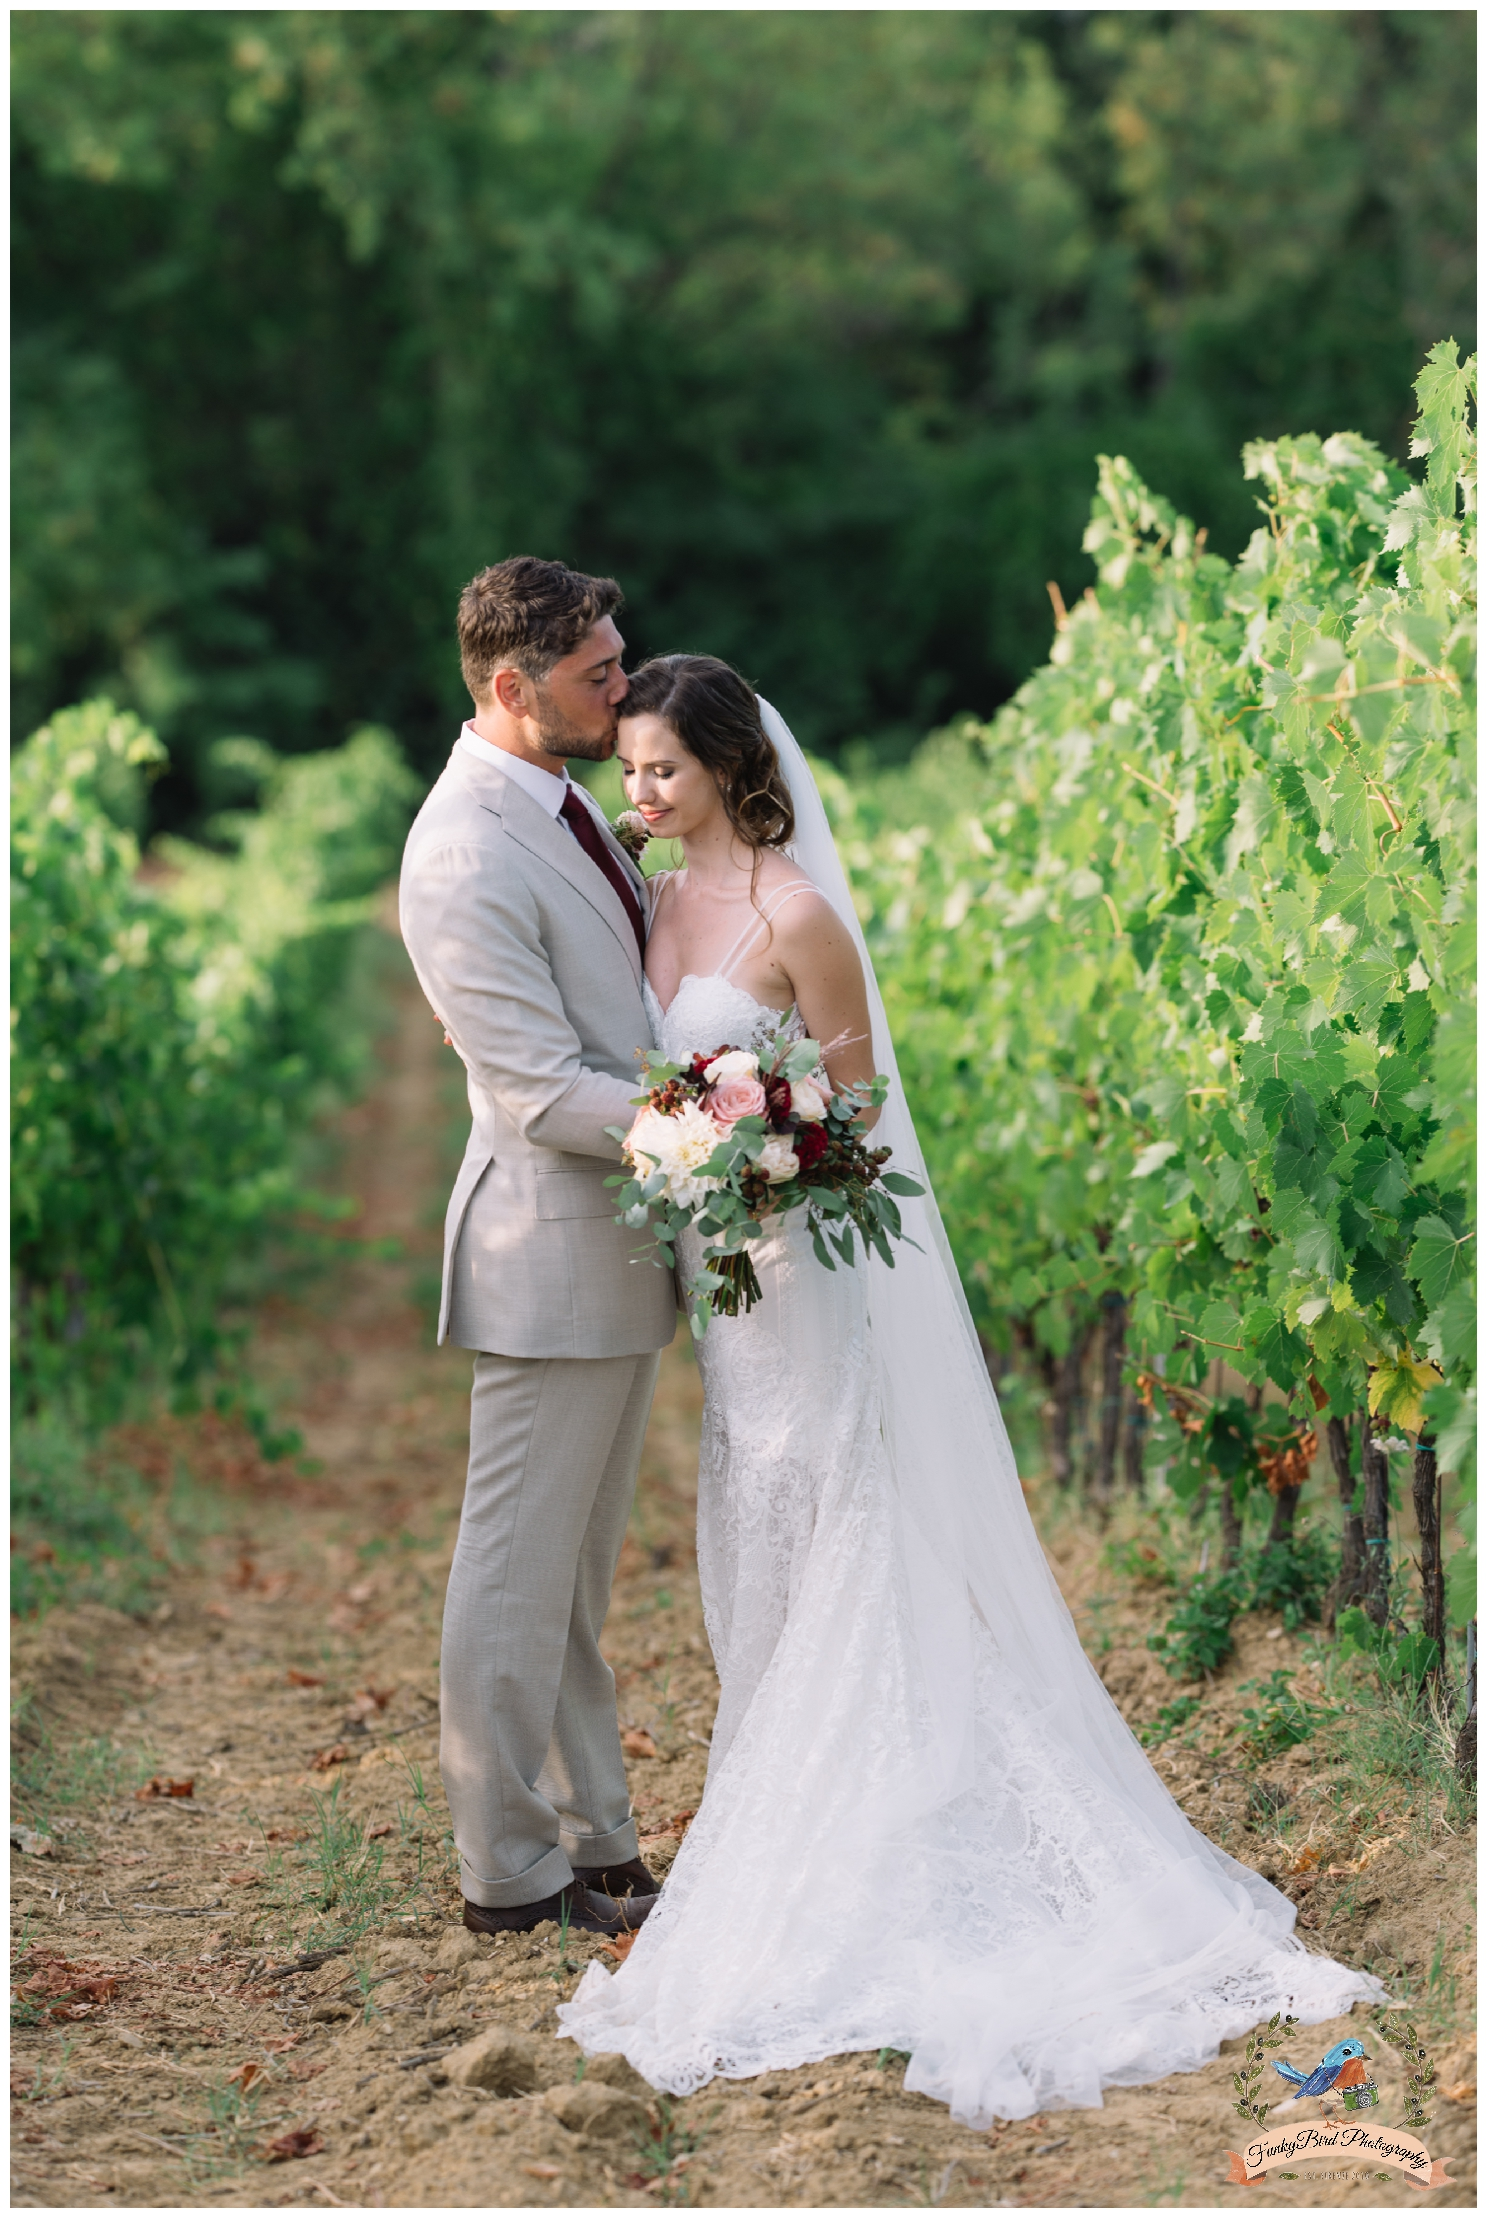 Wedding_Photographer_Tuscany_Italy_0031.jpg